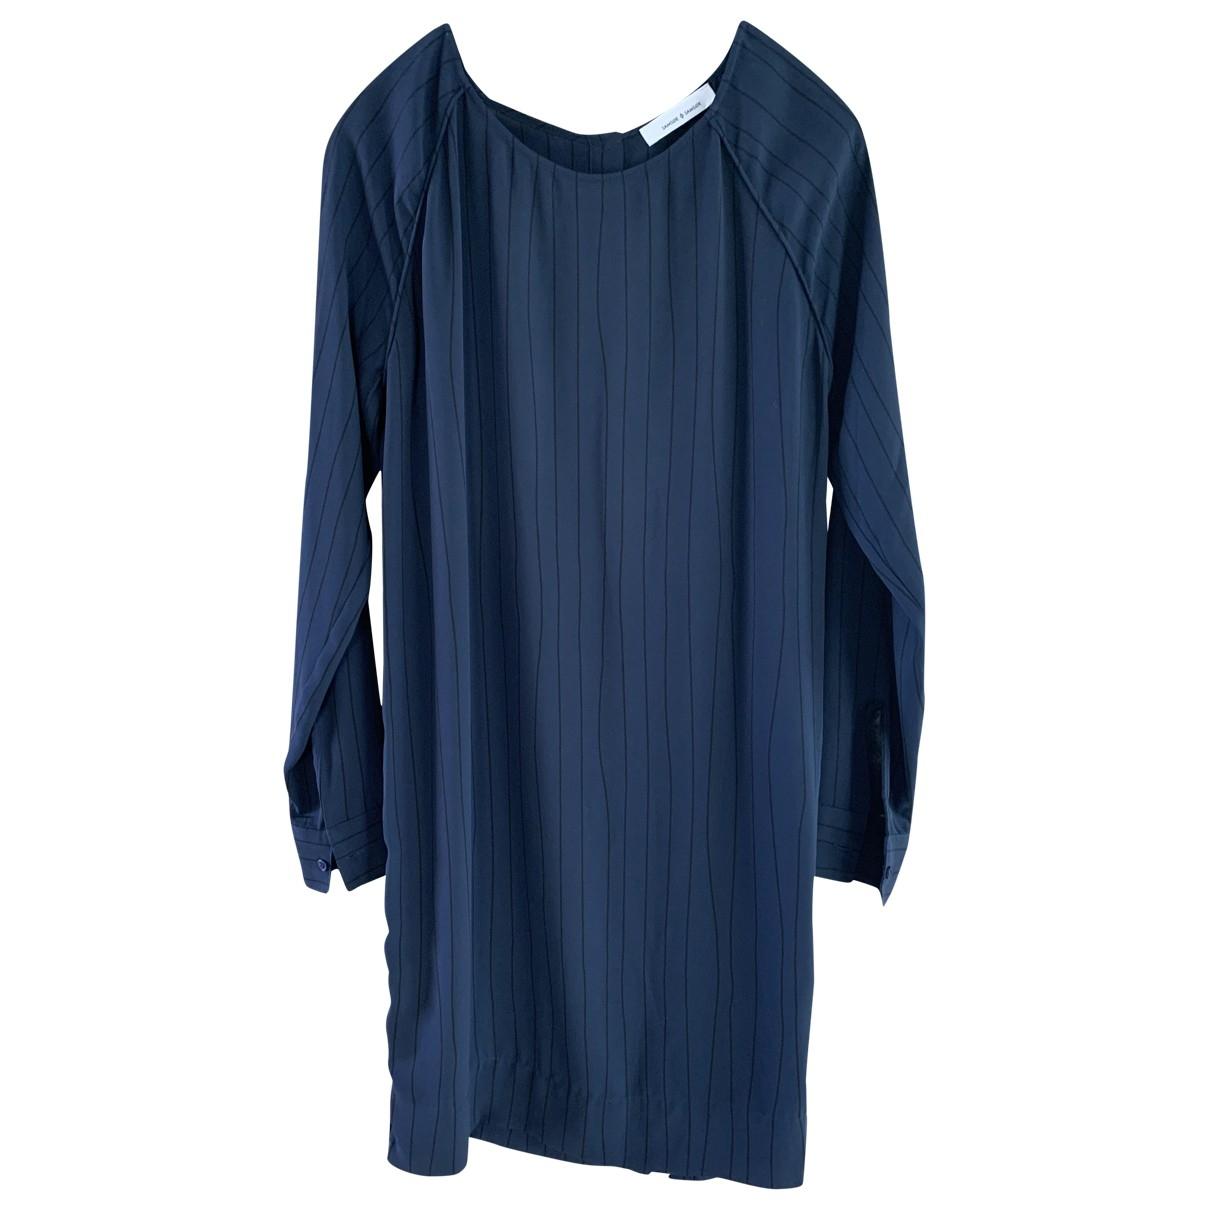 Samsoe & Samsoe \N Blue dress for Women XS International